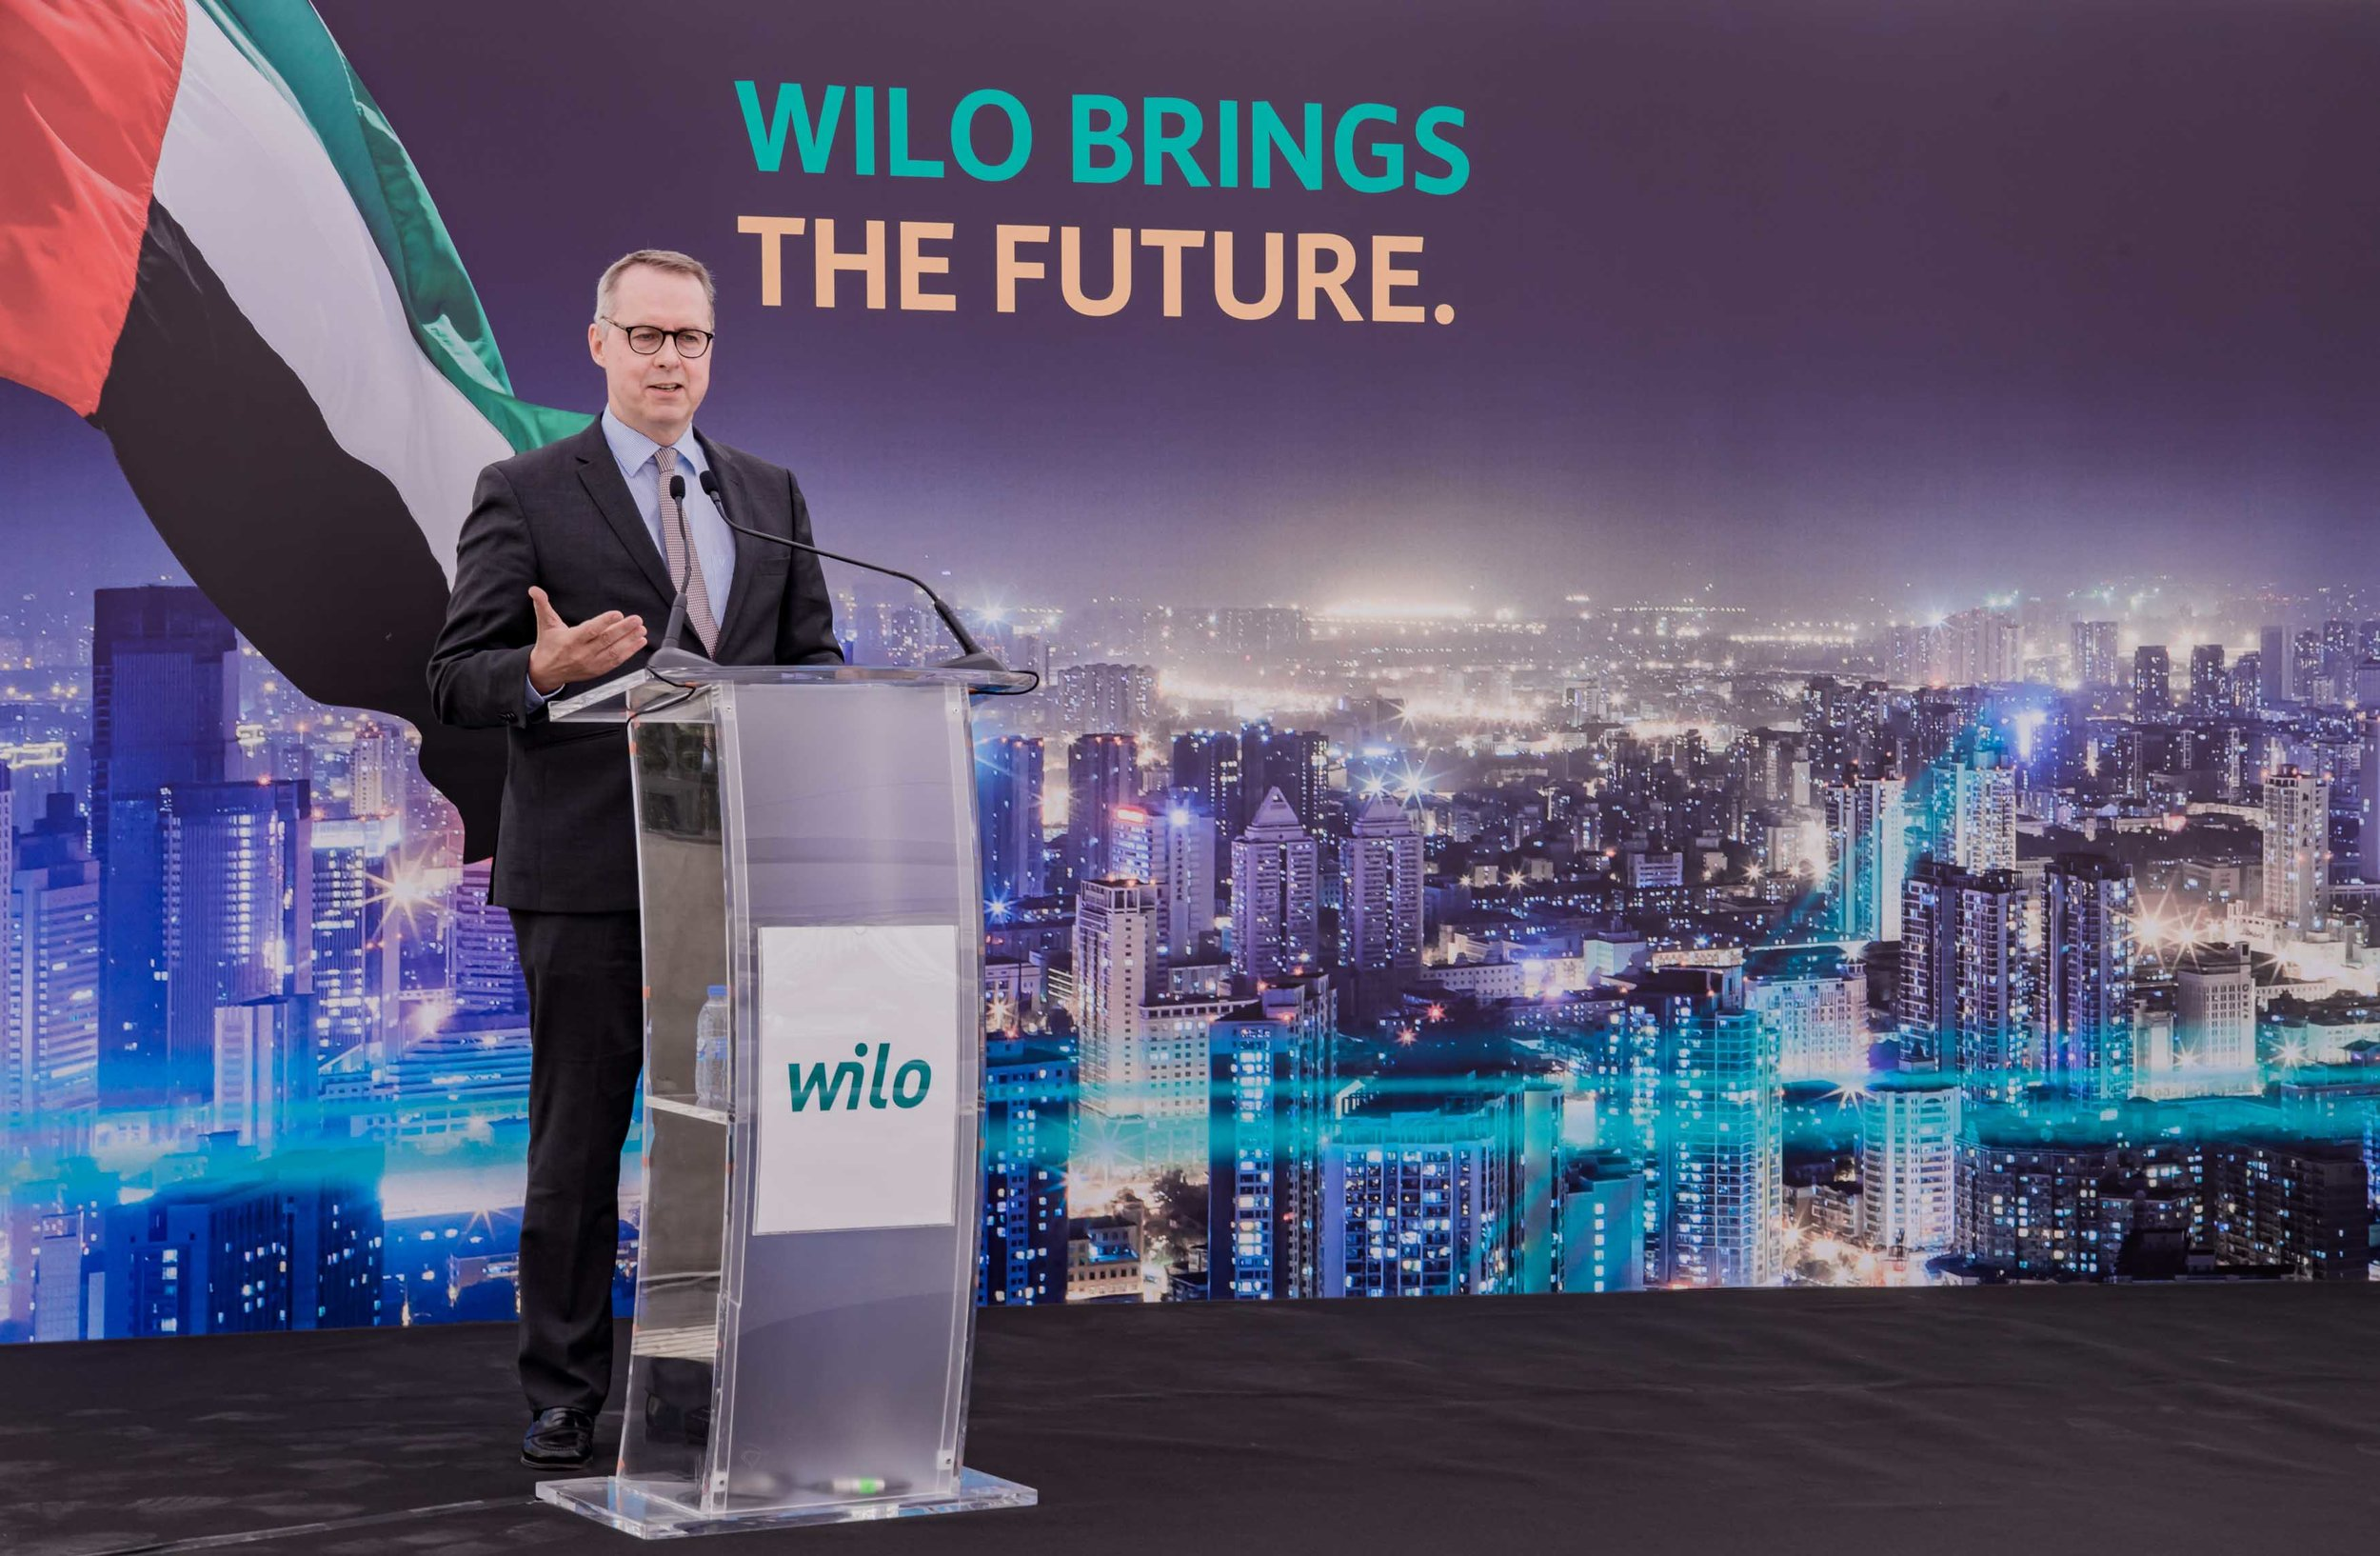 Wilo Inauguration 2019 _ROH6105.jpg